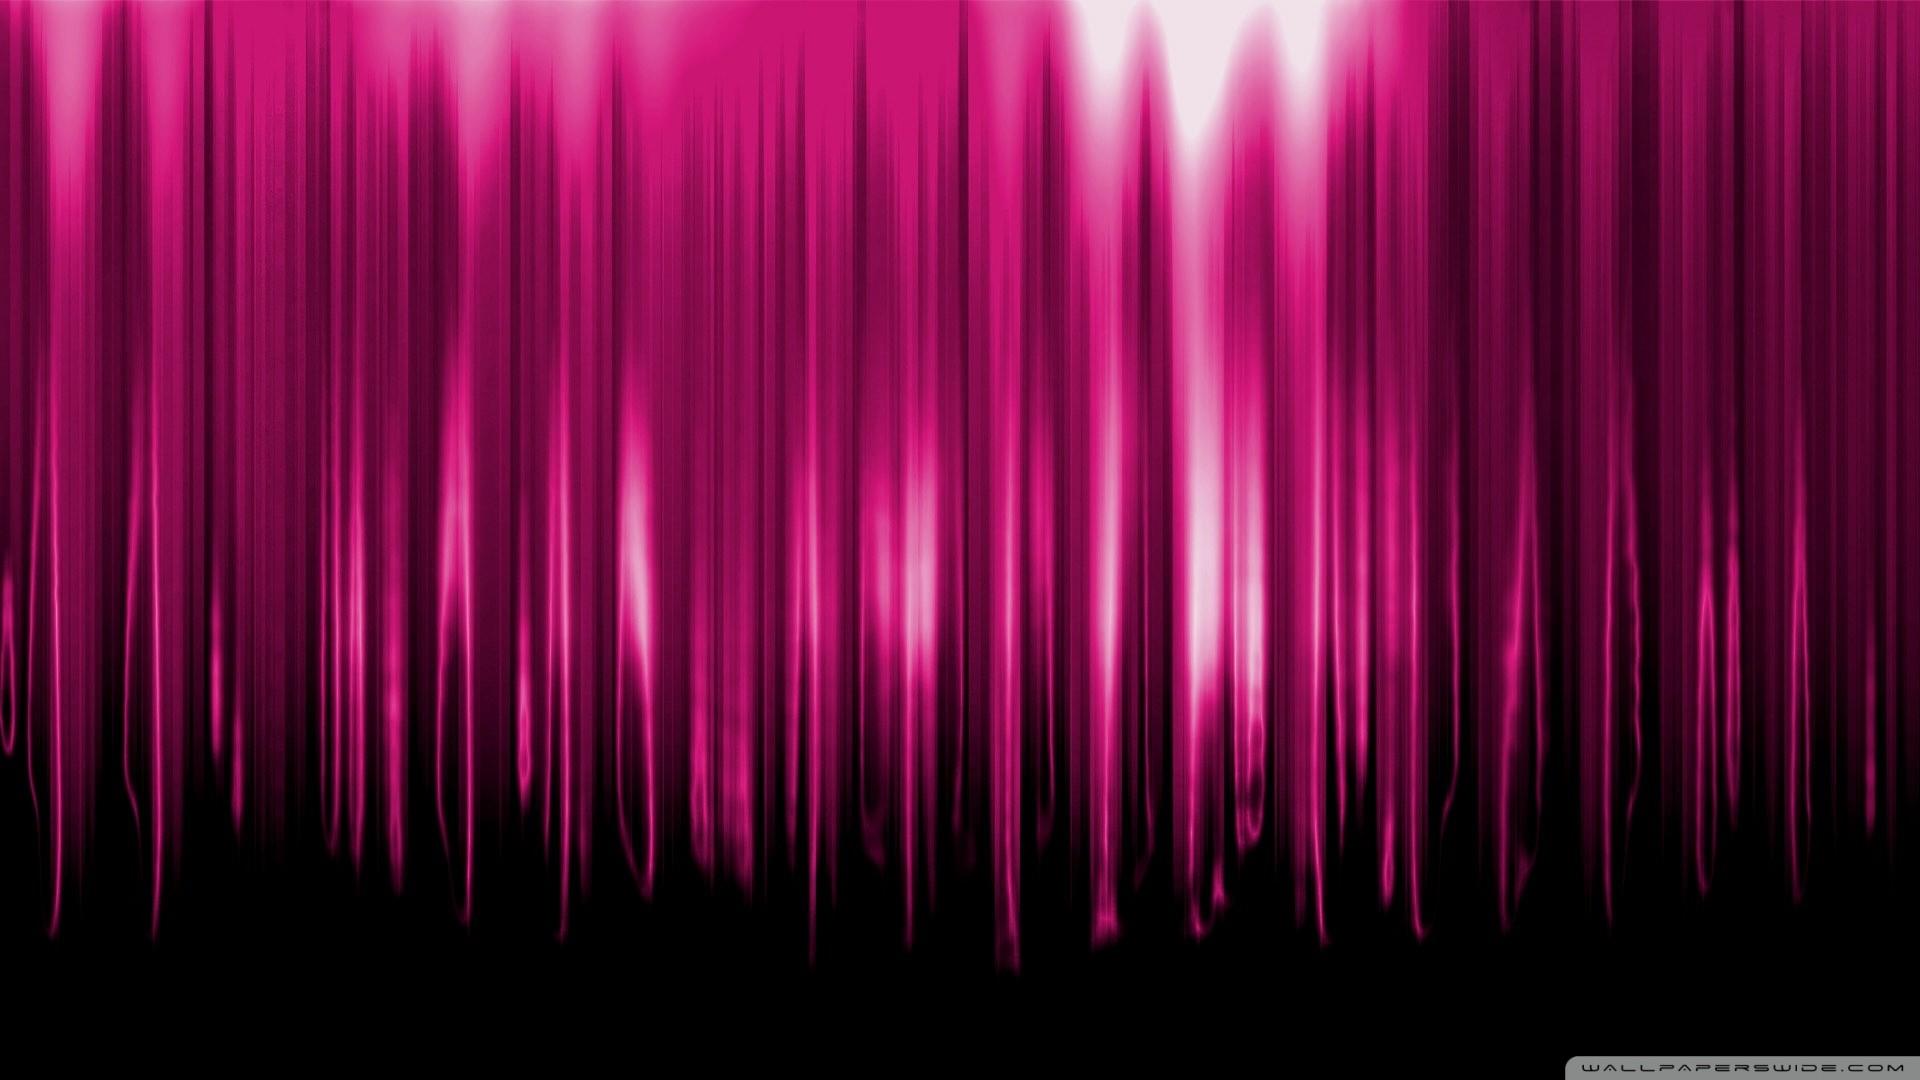 … diamond Pink Wallpaper Cool Pink Wallpapers g9rvEa …